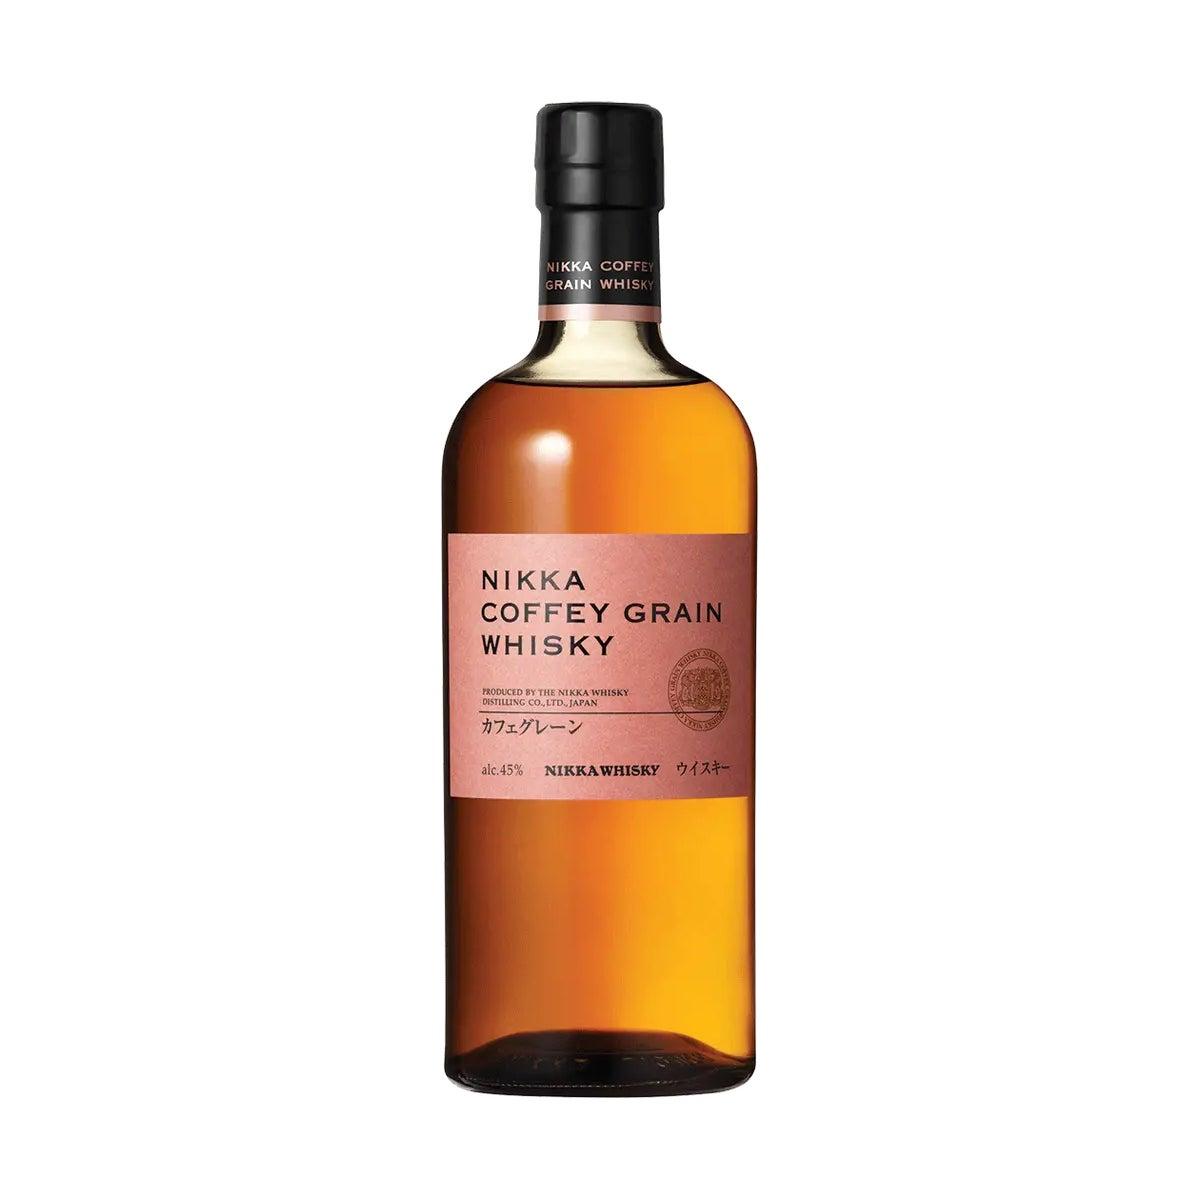 Best Japanese Whiskies Option Nikka Coffey Grain Whisky